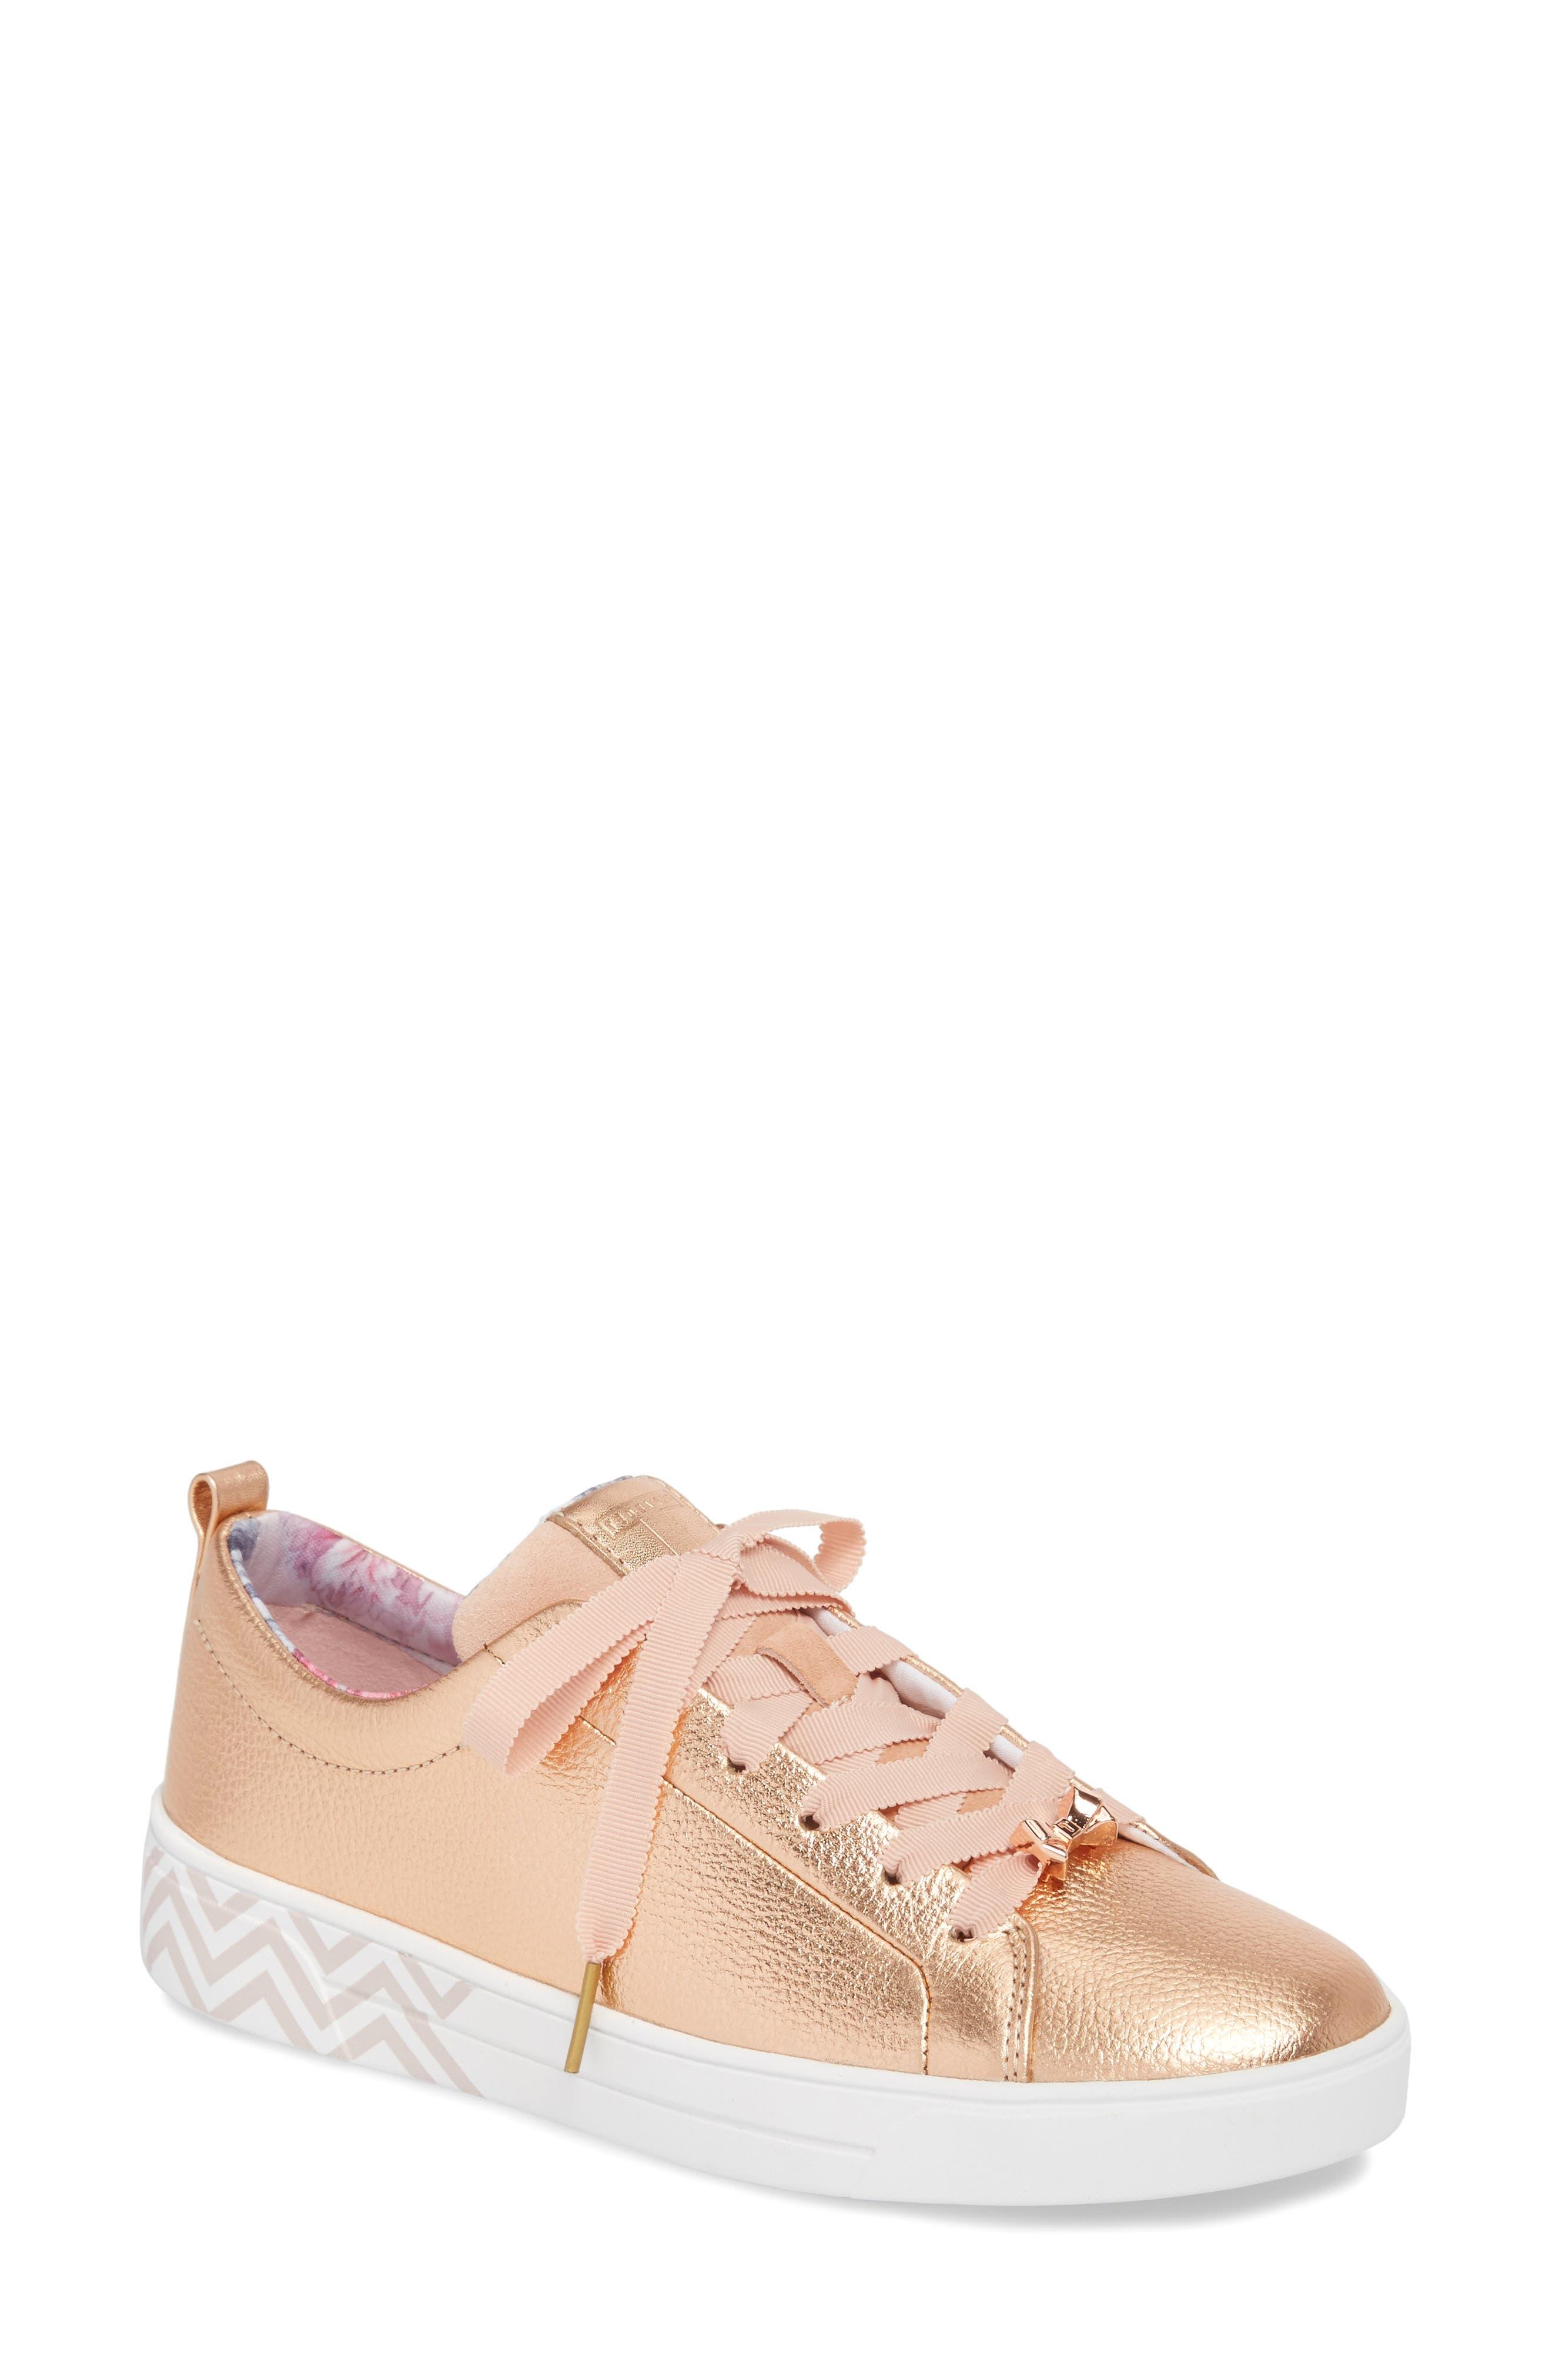 Kelleip Sneaker,                         Main,                         color, ROSE GOLD/ PALACE GARDENS